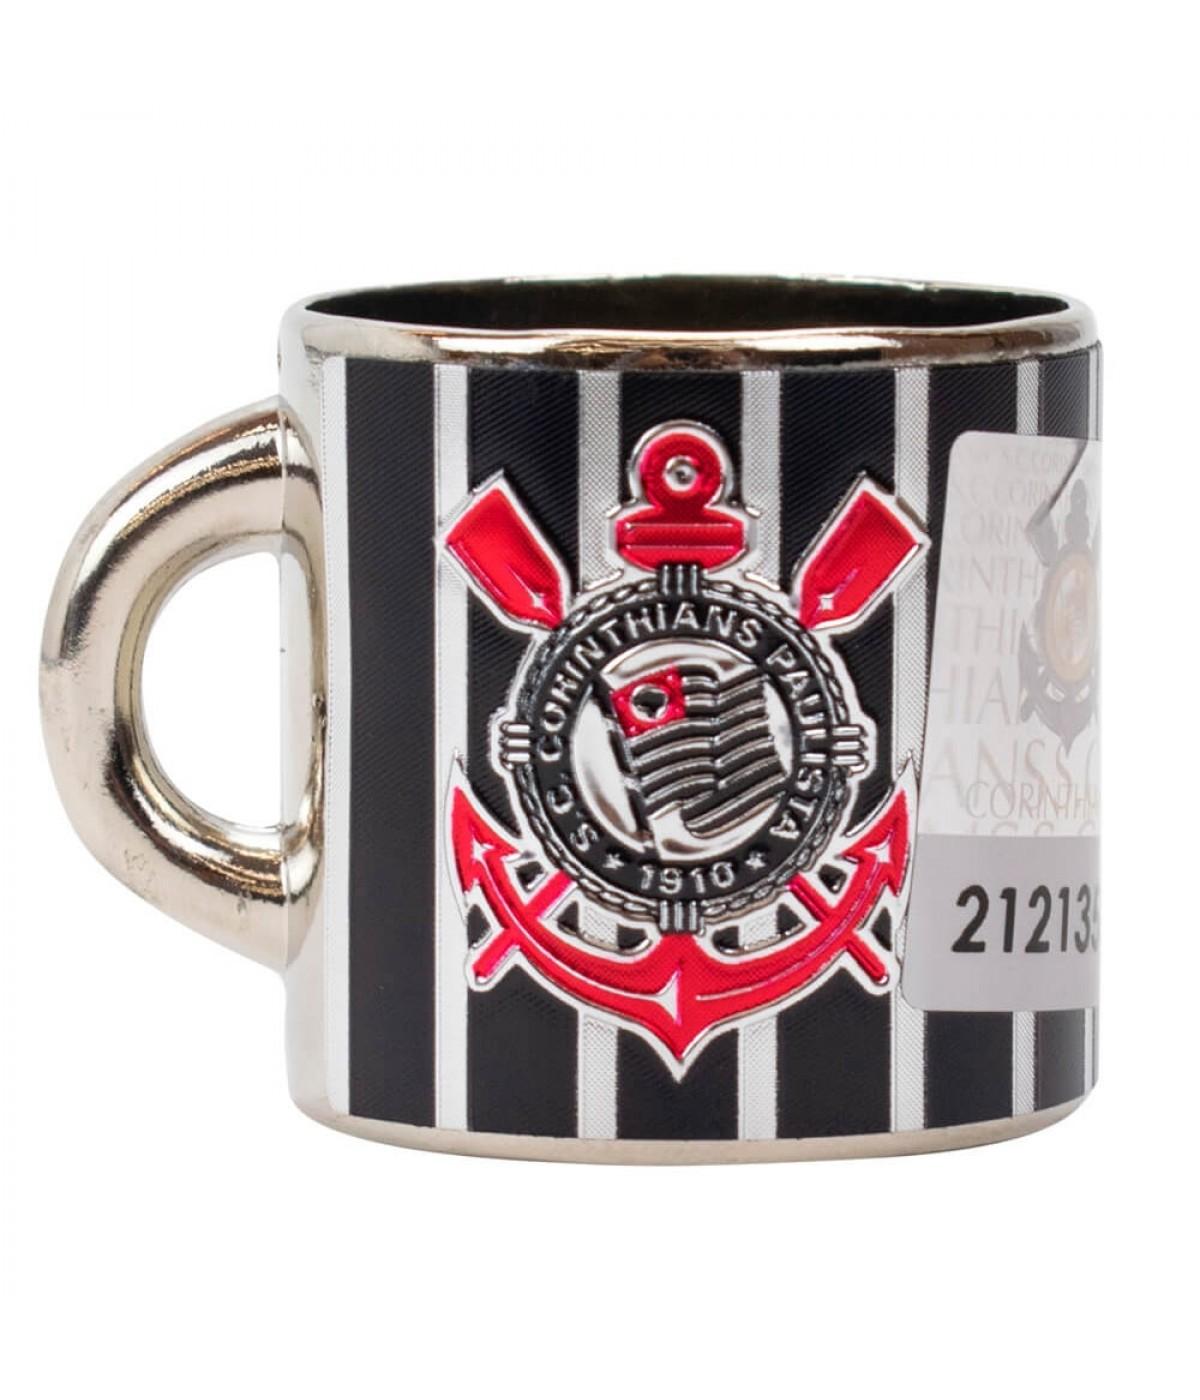 Mini Caneca Decorativa Ímã Metal 3.5cm - Corinthians